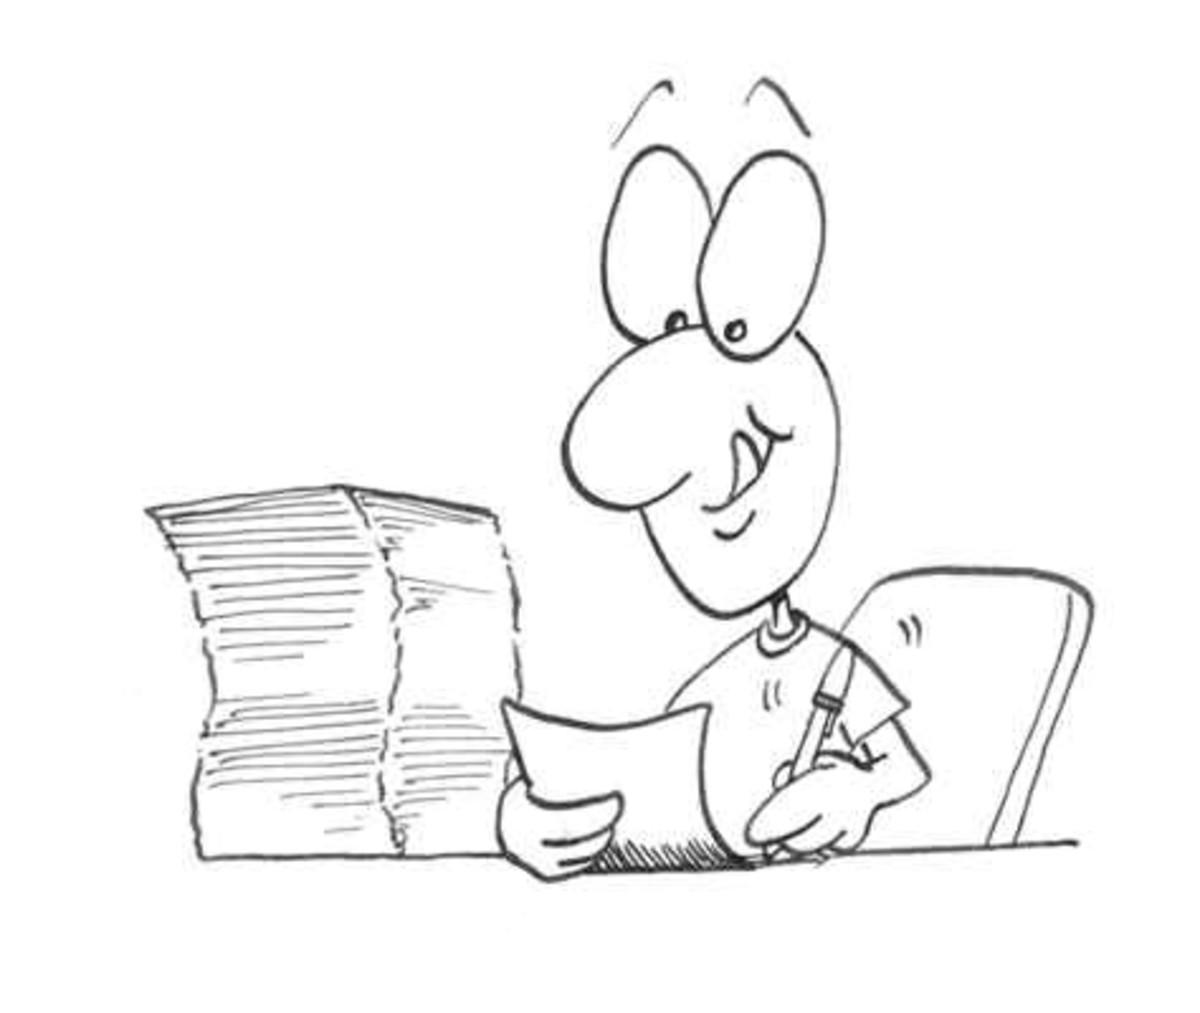 Freelance Writing Process (Image source: www.tip.duke.edu)